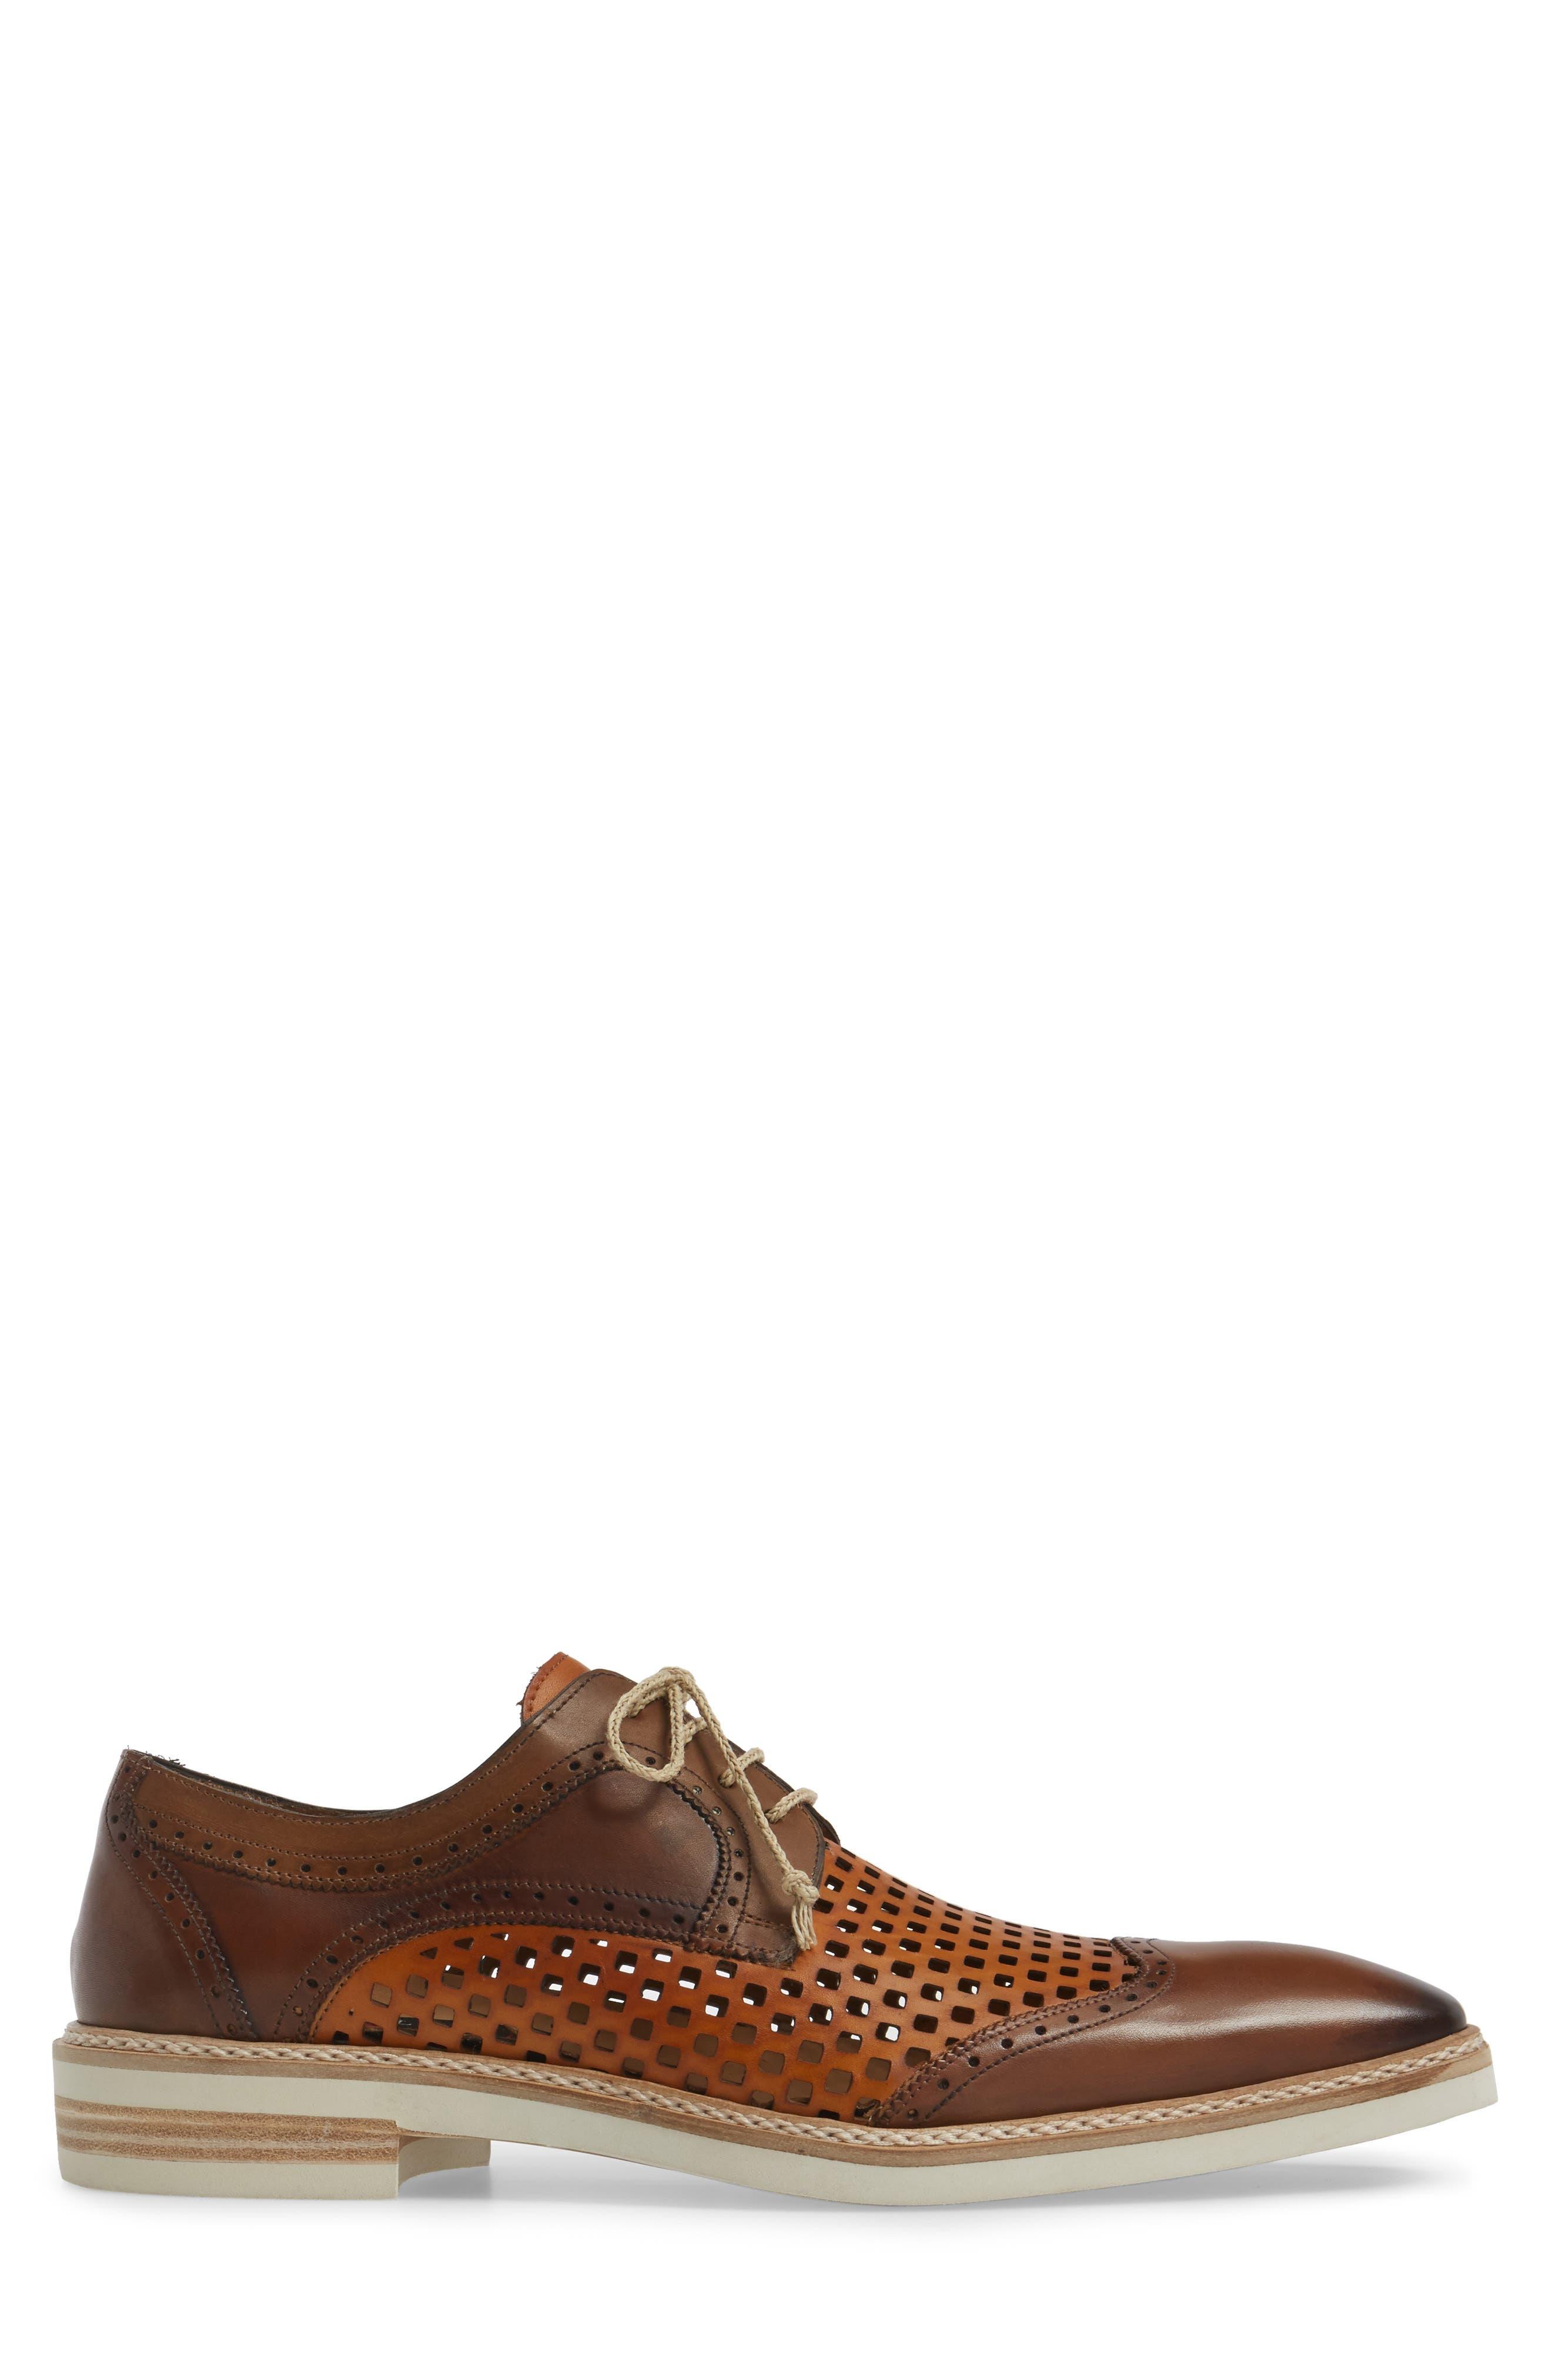 Alvarez Spectator Shoe,                             Alternate thumbnail 3, color,                             Cognac Multi Leather